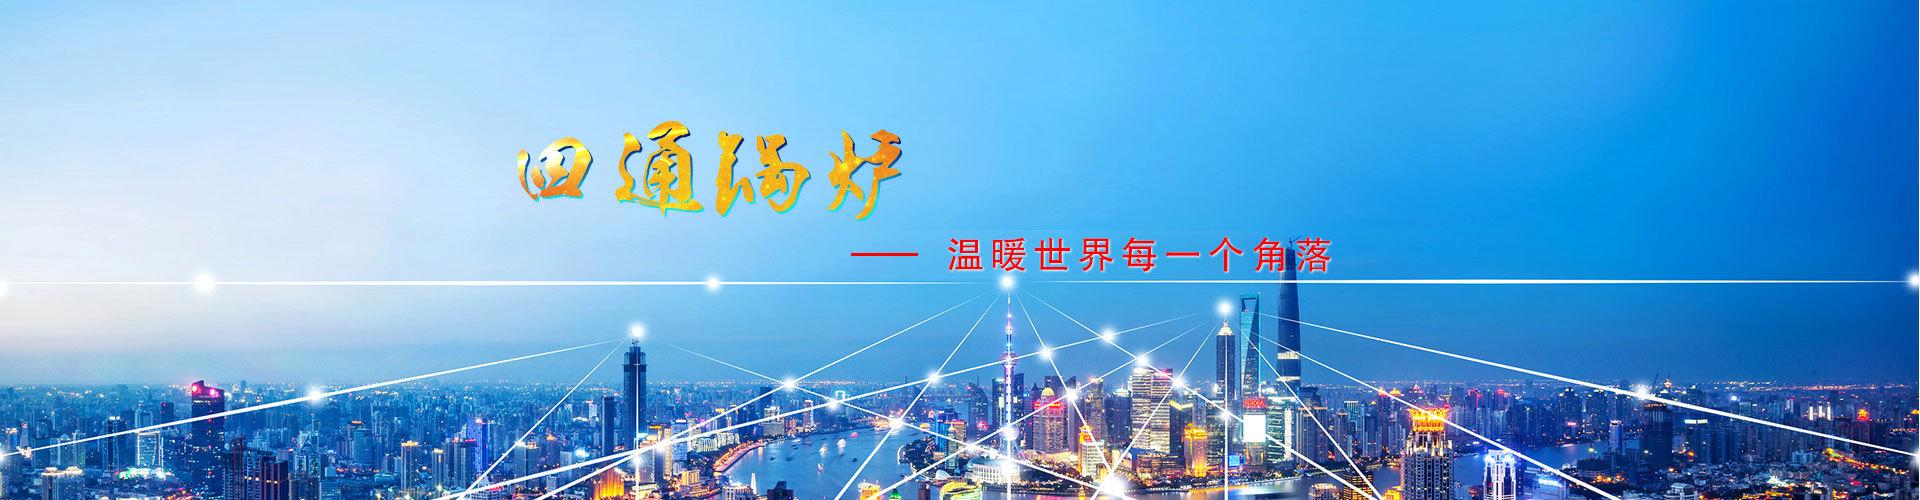 网站用banner 网页 企业官网 luoboqingcai - 原创